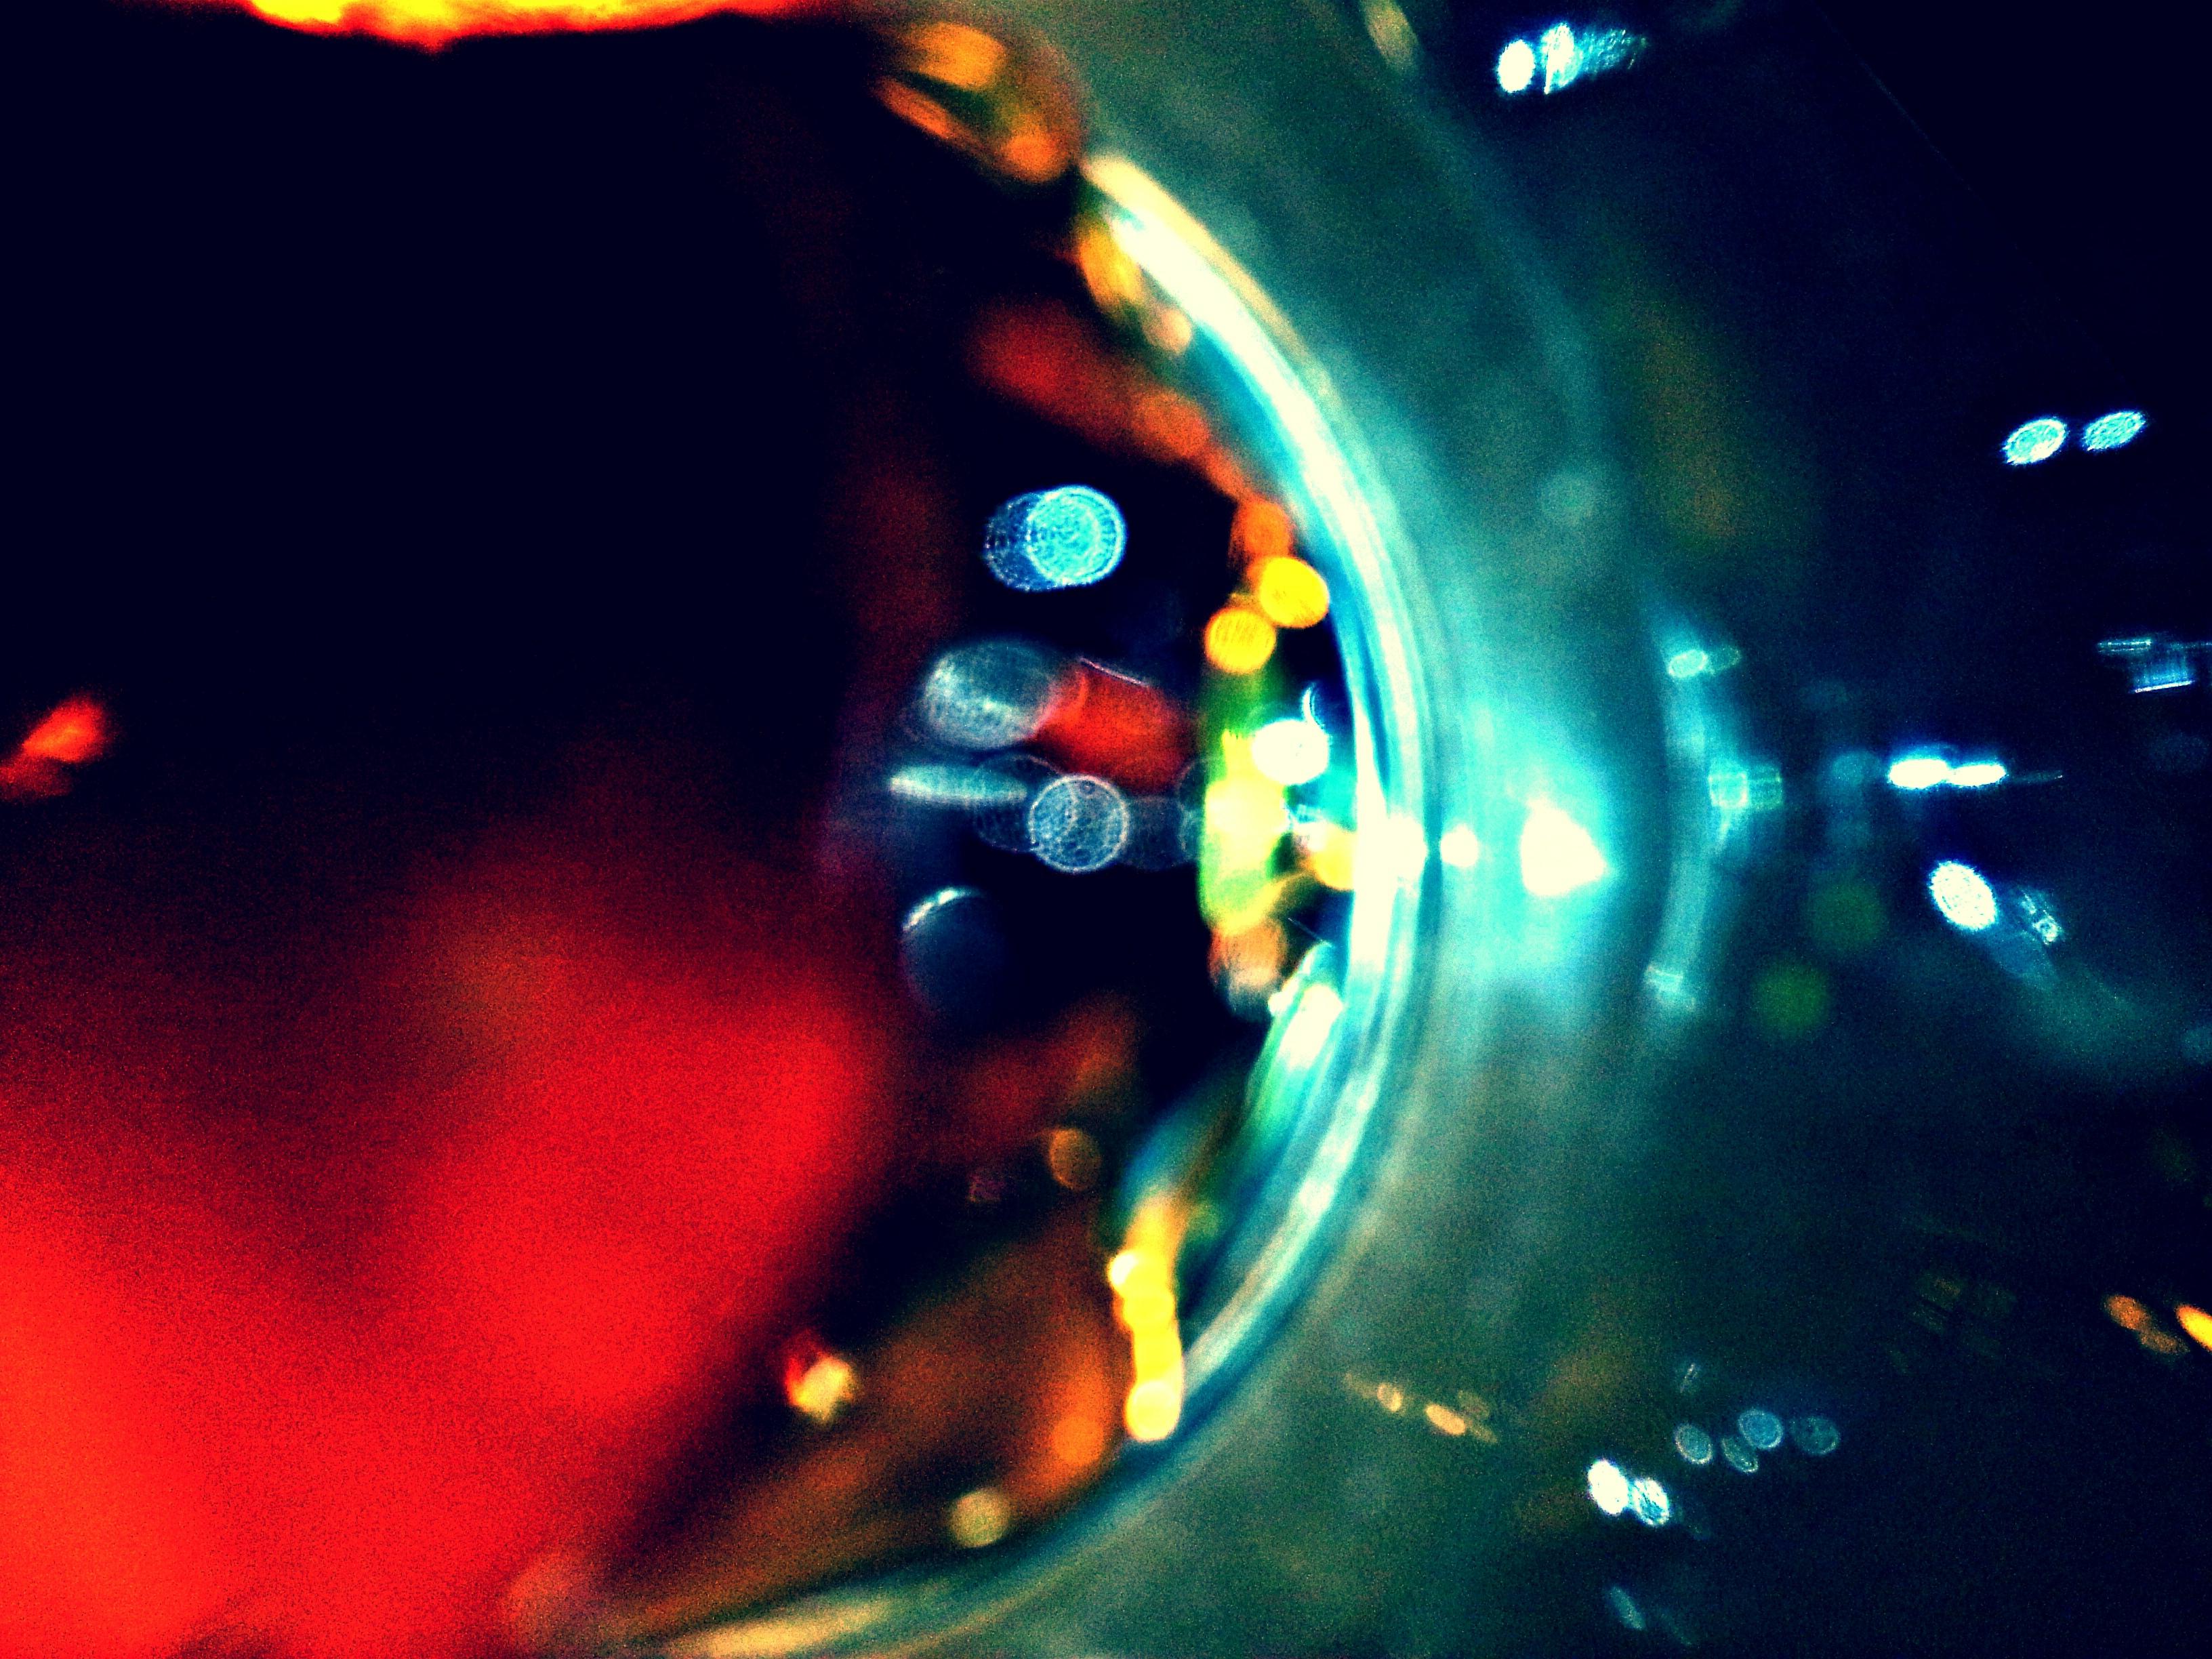 Abstract Collective - 9 (UAO)